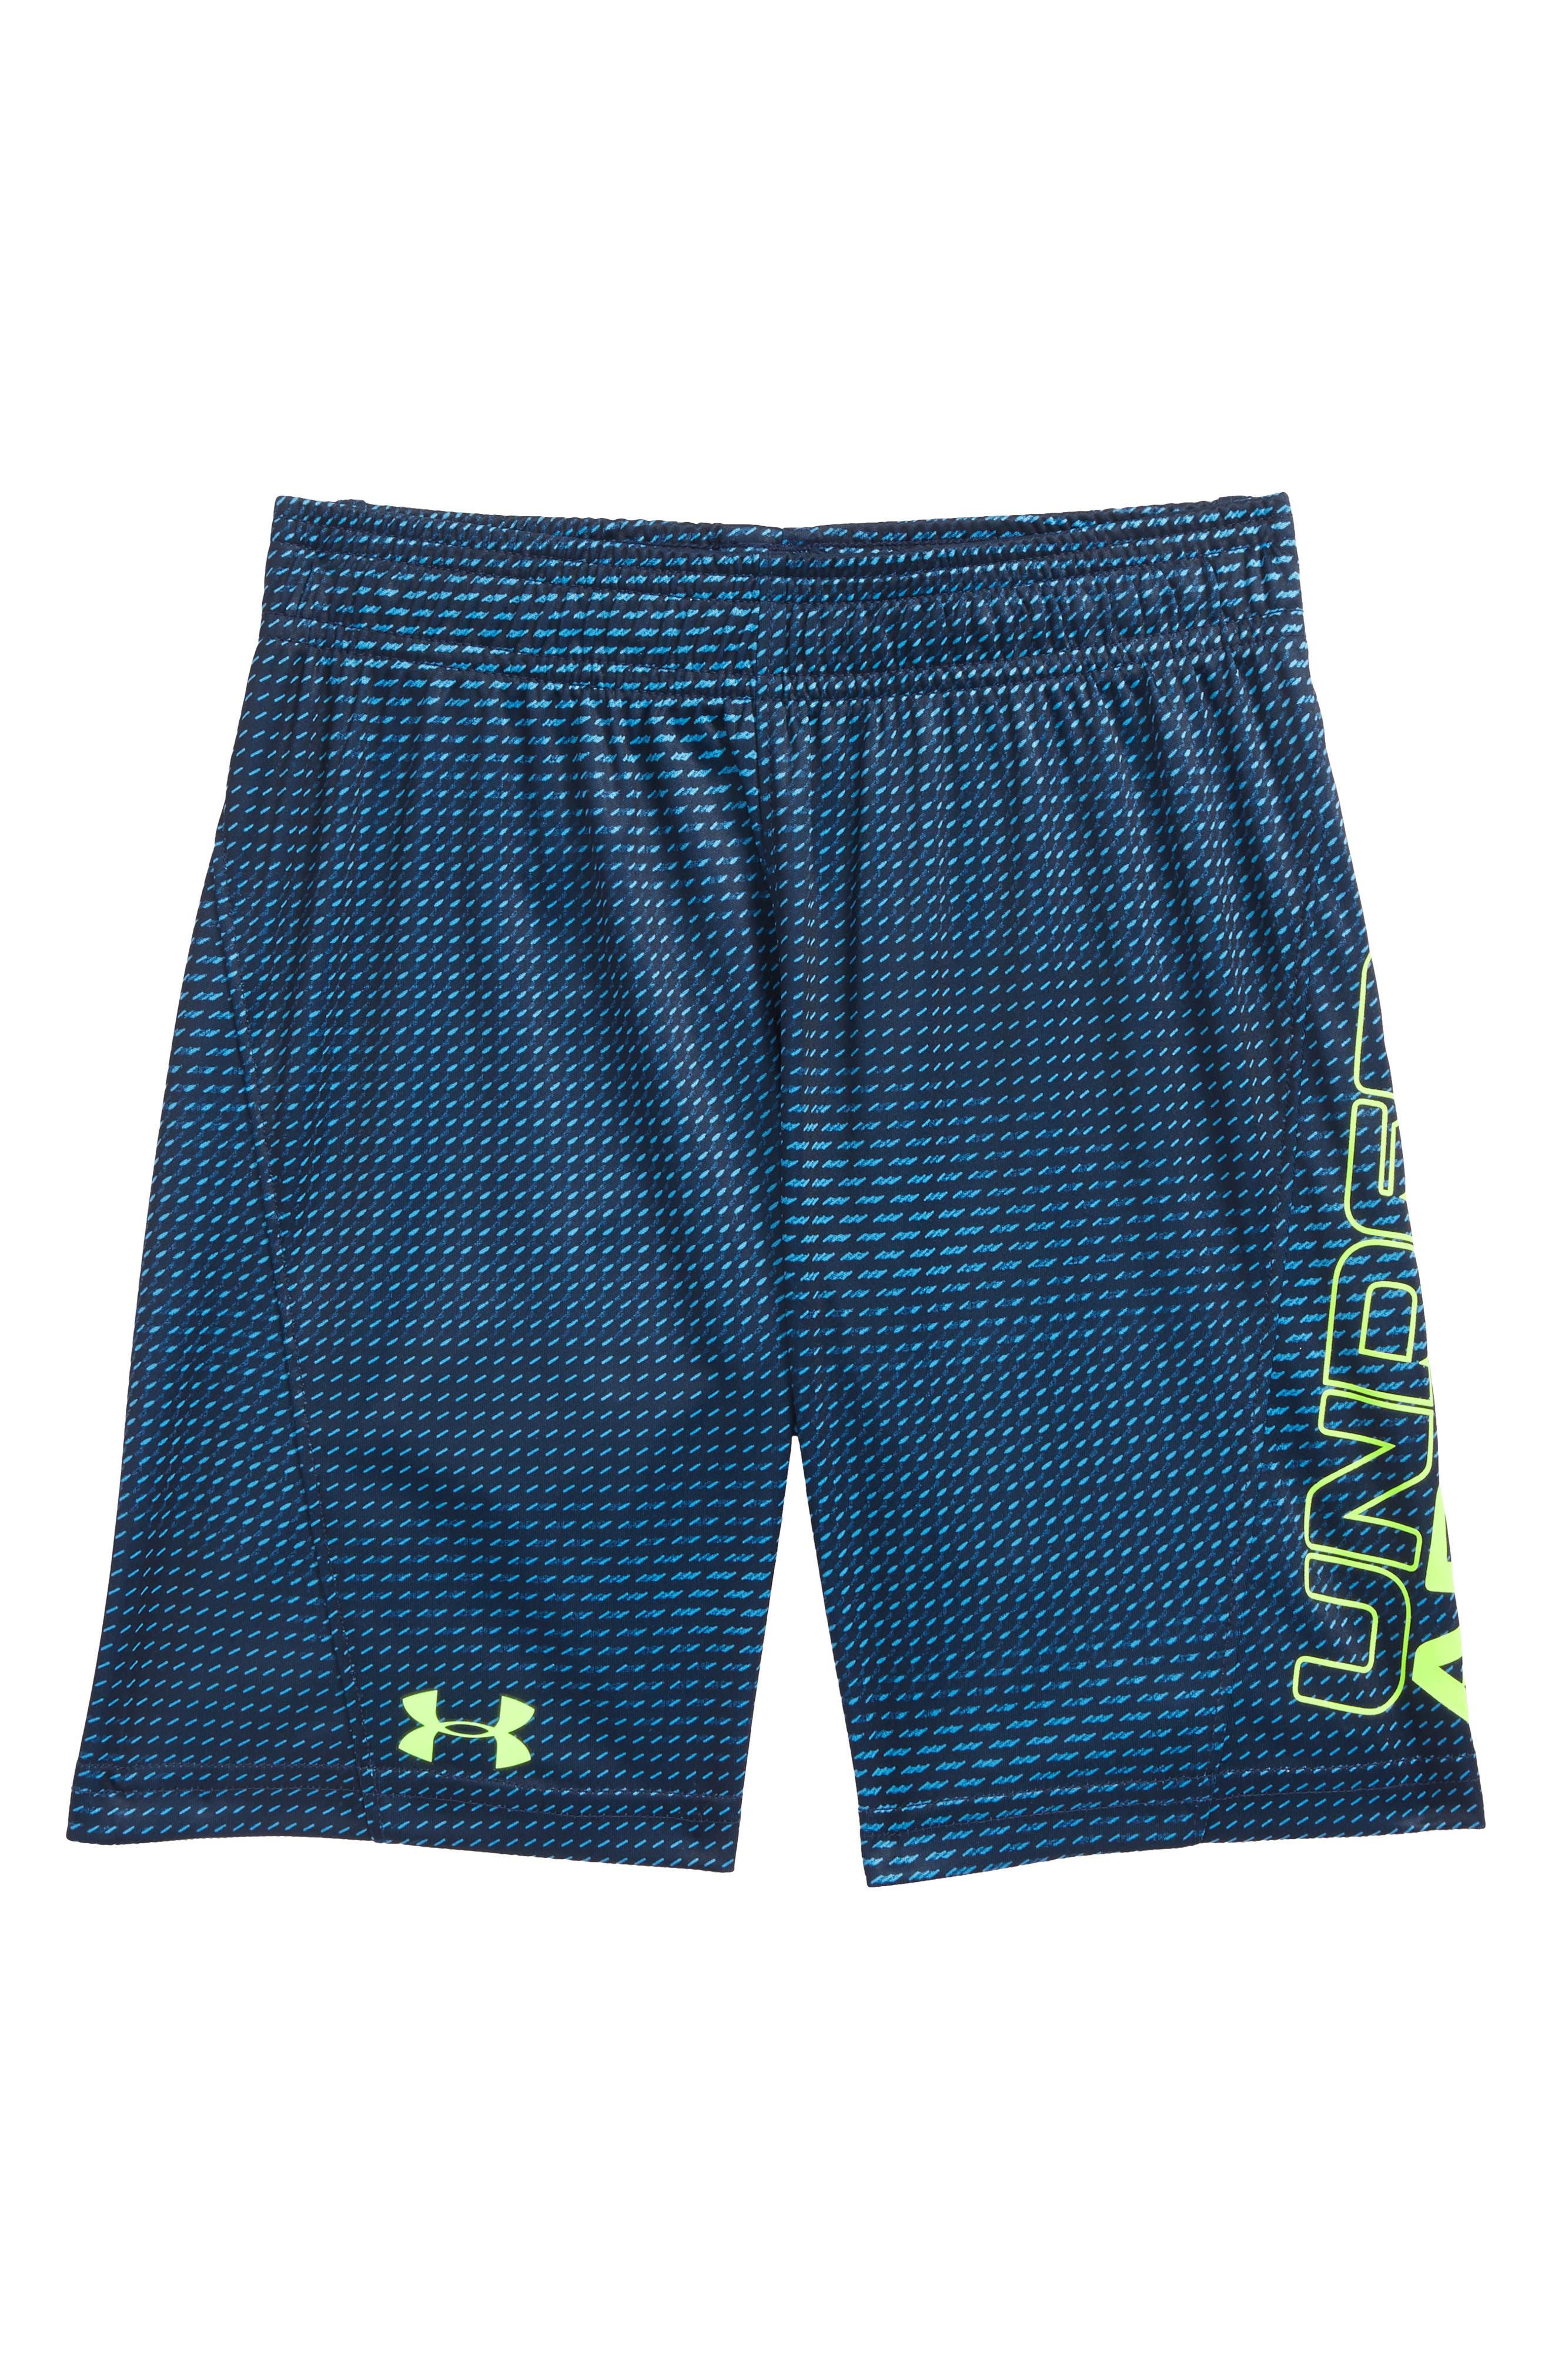 Sync Boost HeatGear<sup>®</sup> Shorts,                             Main thumbnail 1, color,                             450